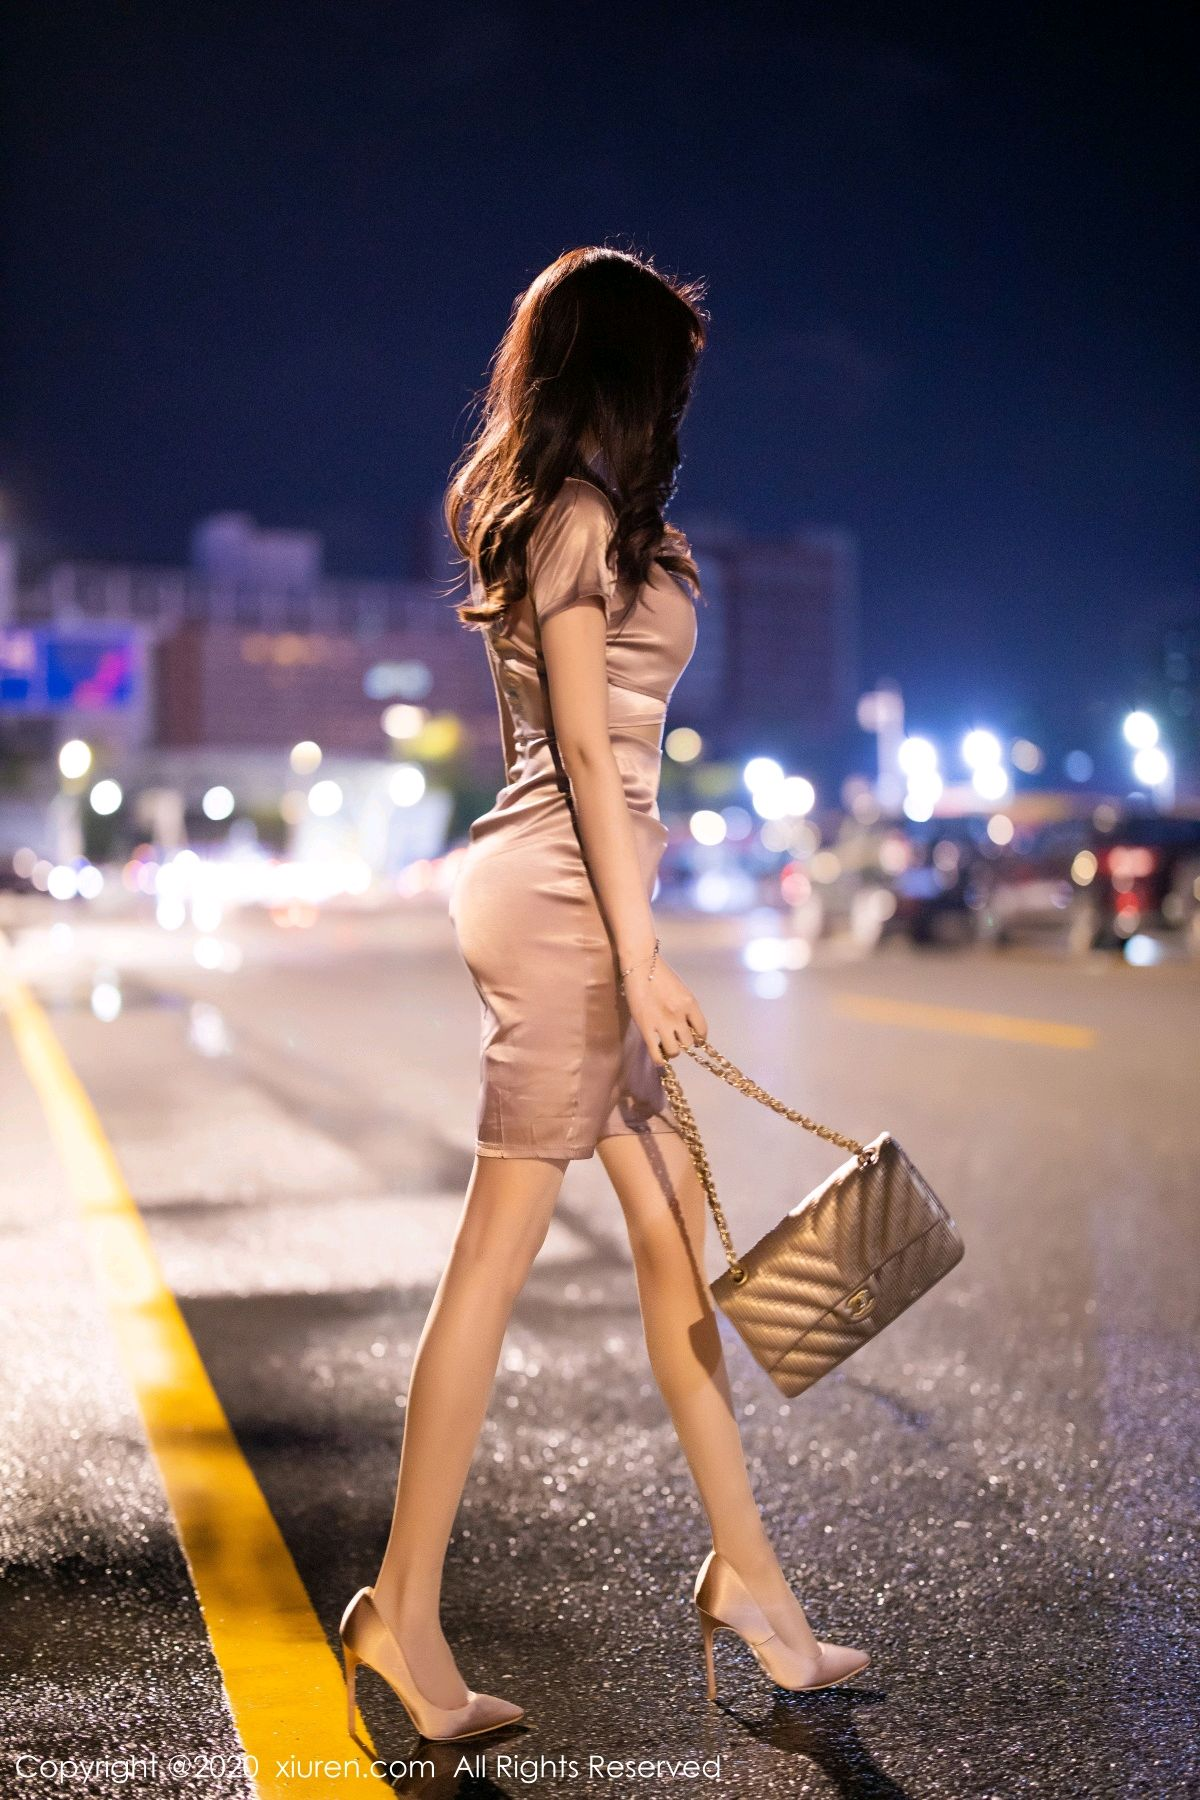 [XiuRen] Vol.2587 Yang Chen Chen 15P, Underwear, Xiuren, Yang Chen Chen